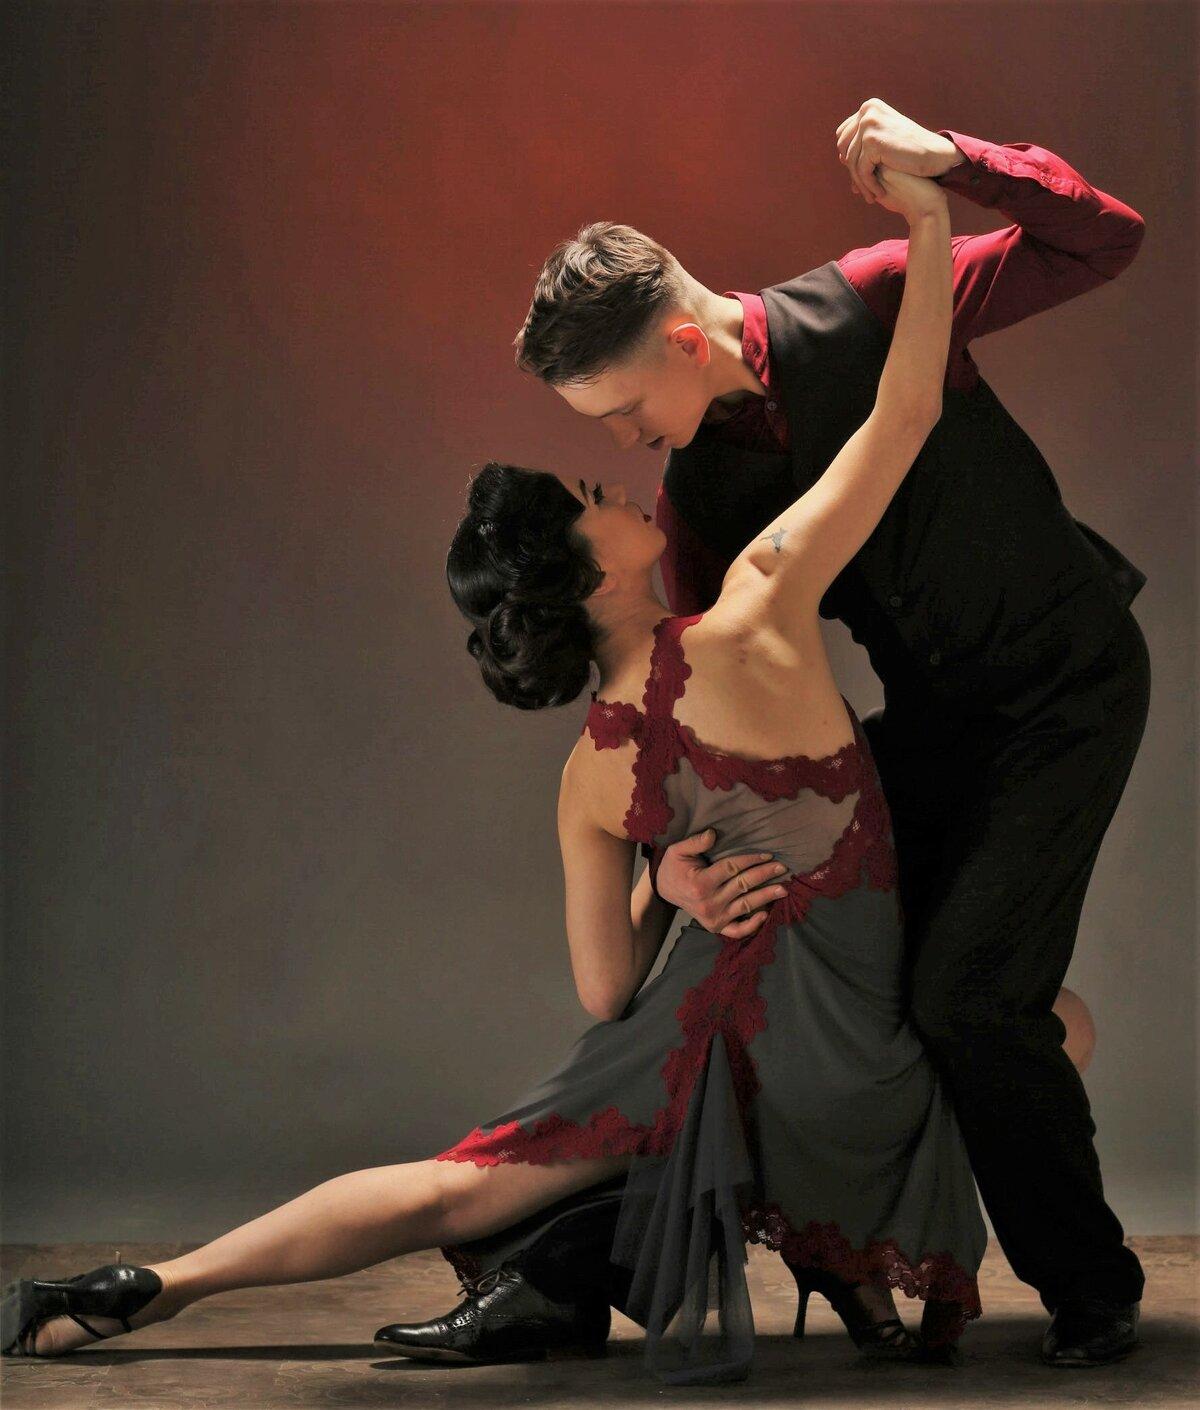 разные, размеру, аргентинское танго картинки сурикаты картинки